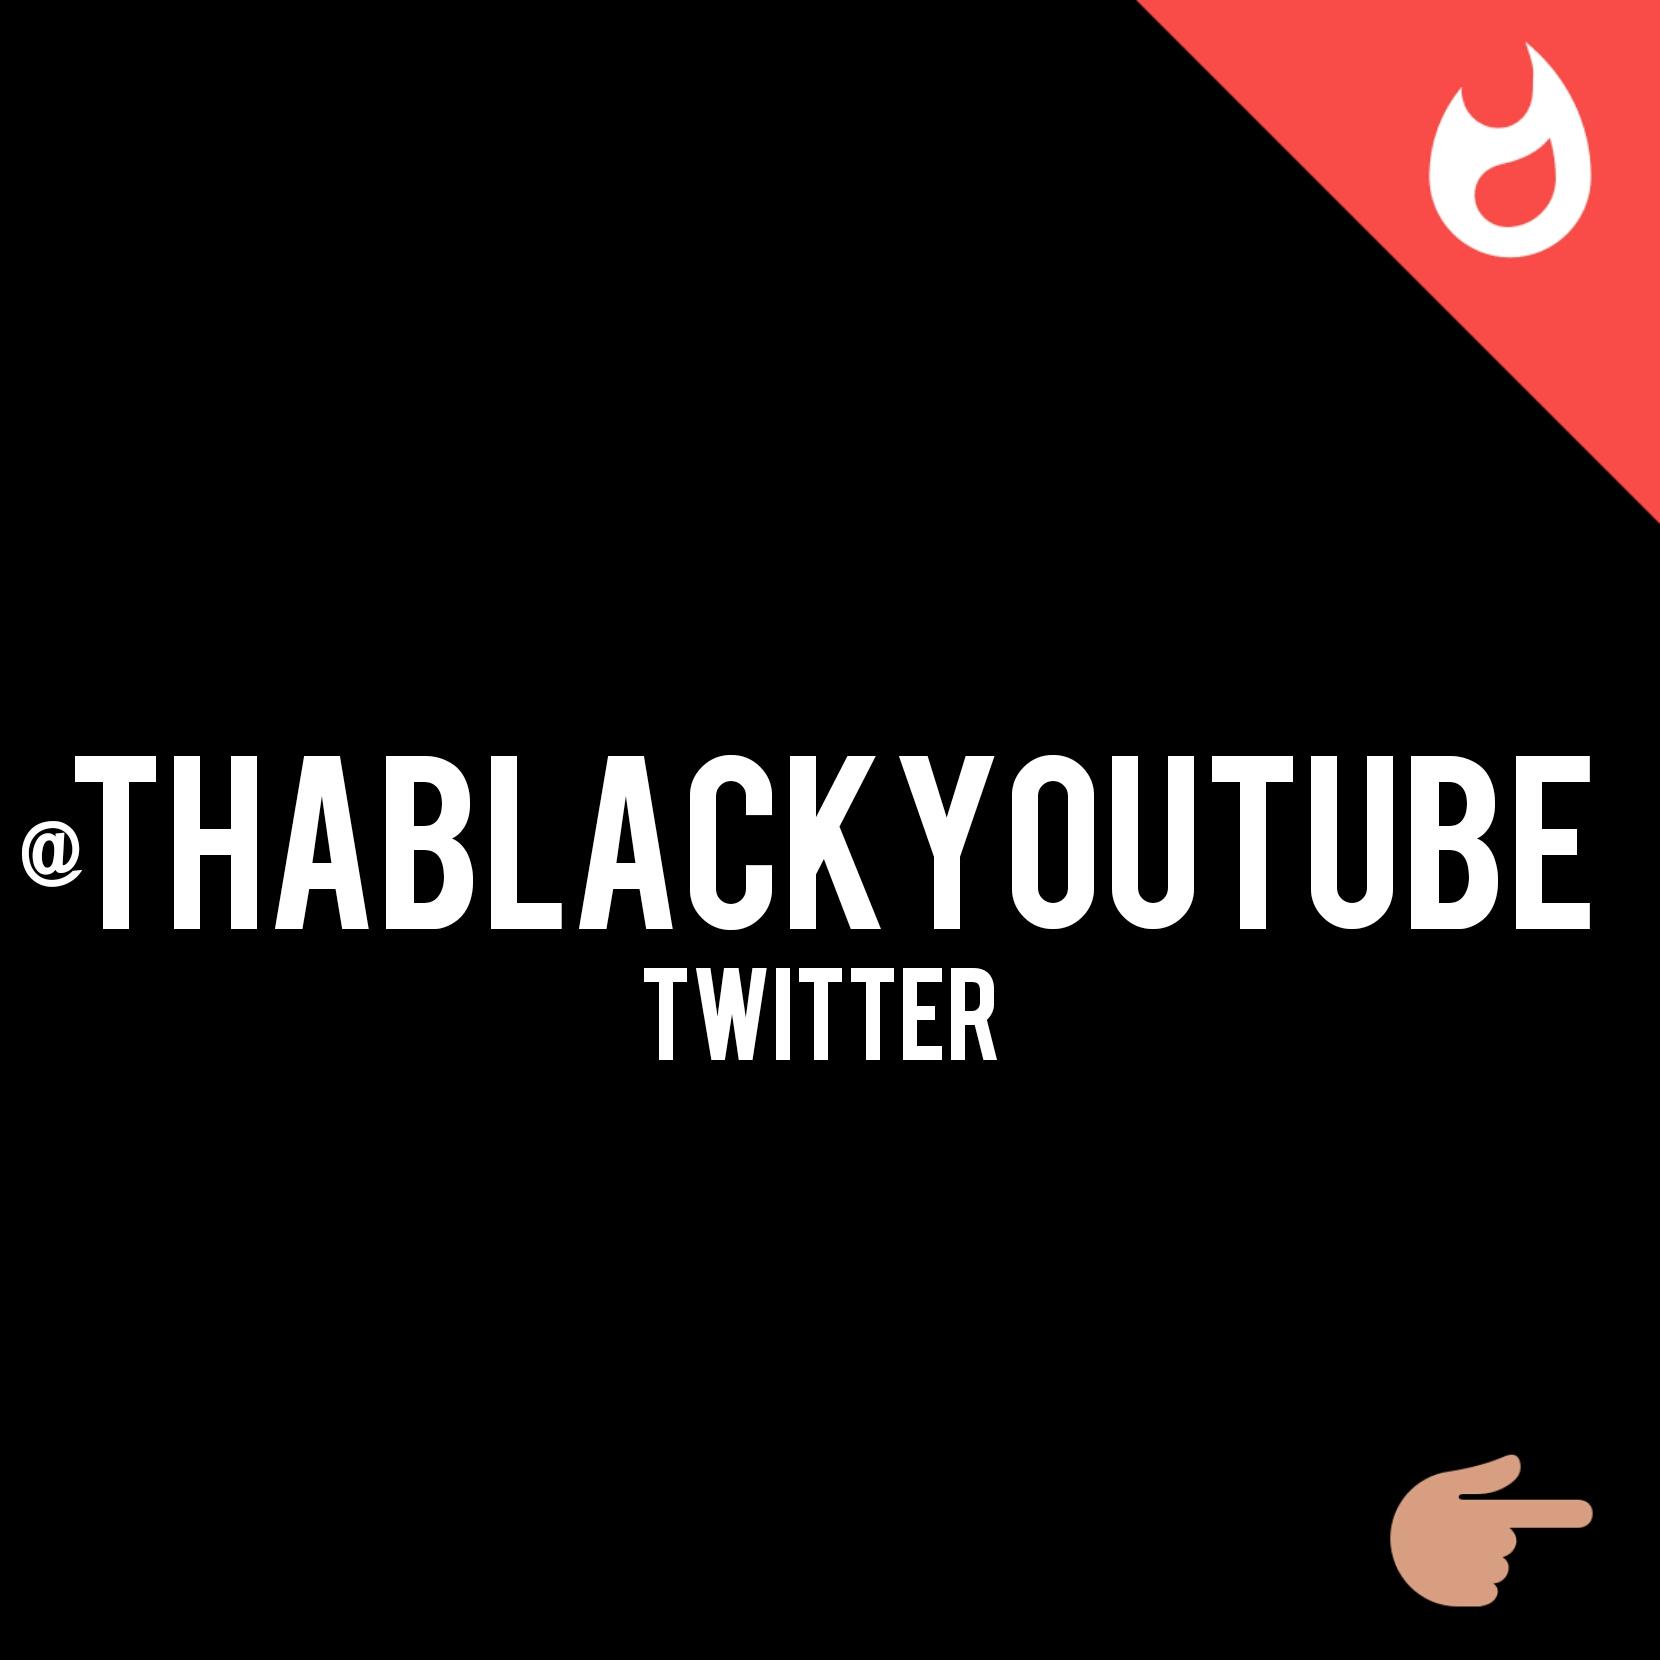 ThaBlackYouTube Twitter